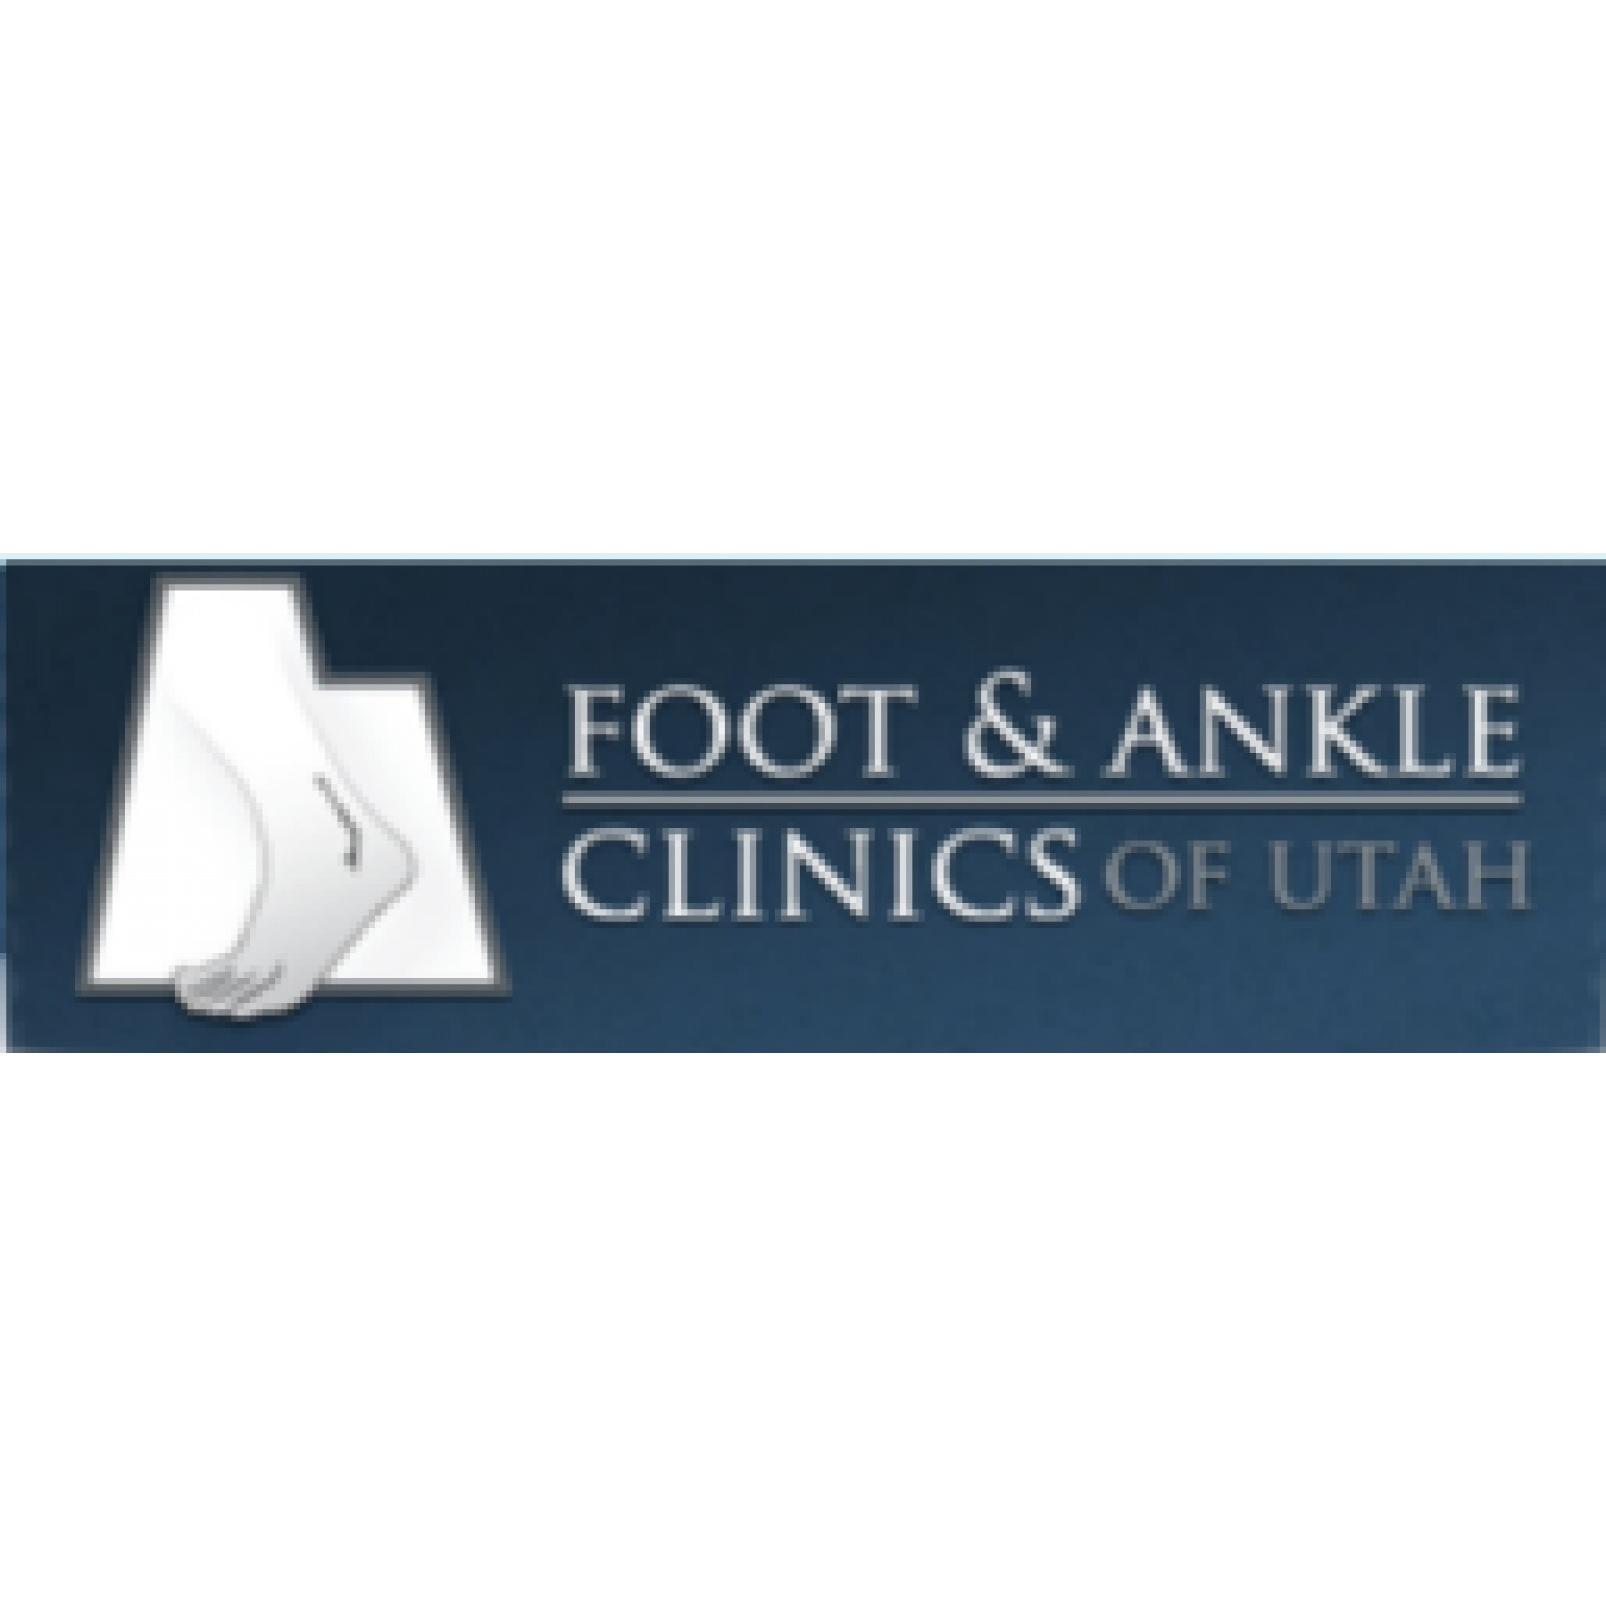 Foot & Ankle Clinics of Utah image 1